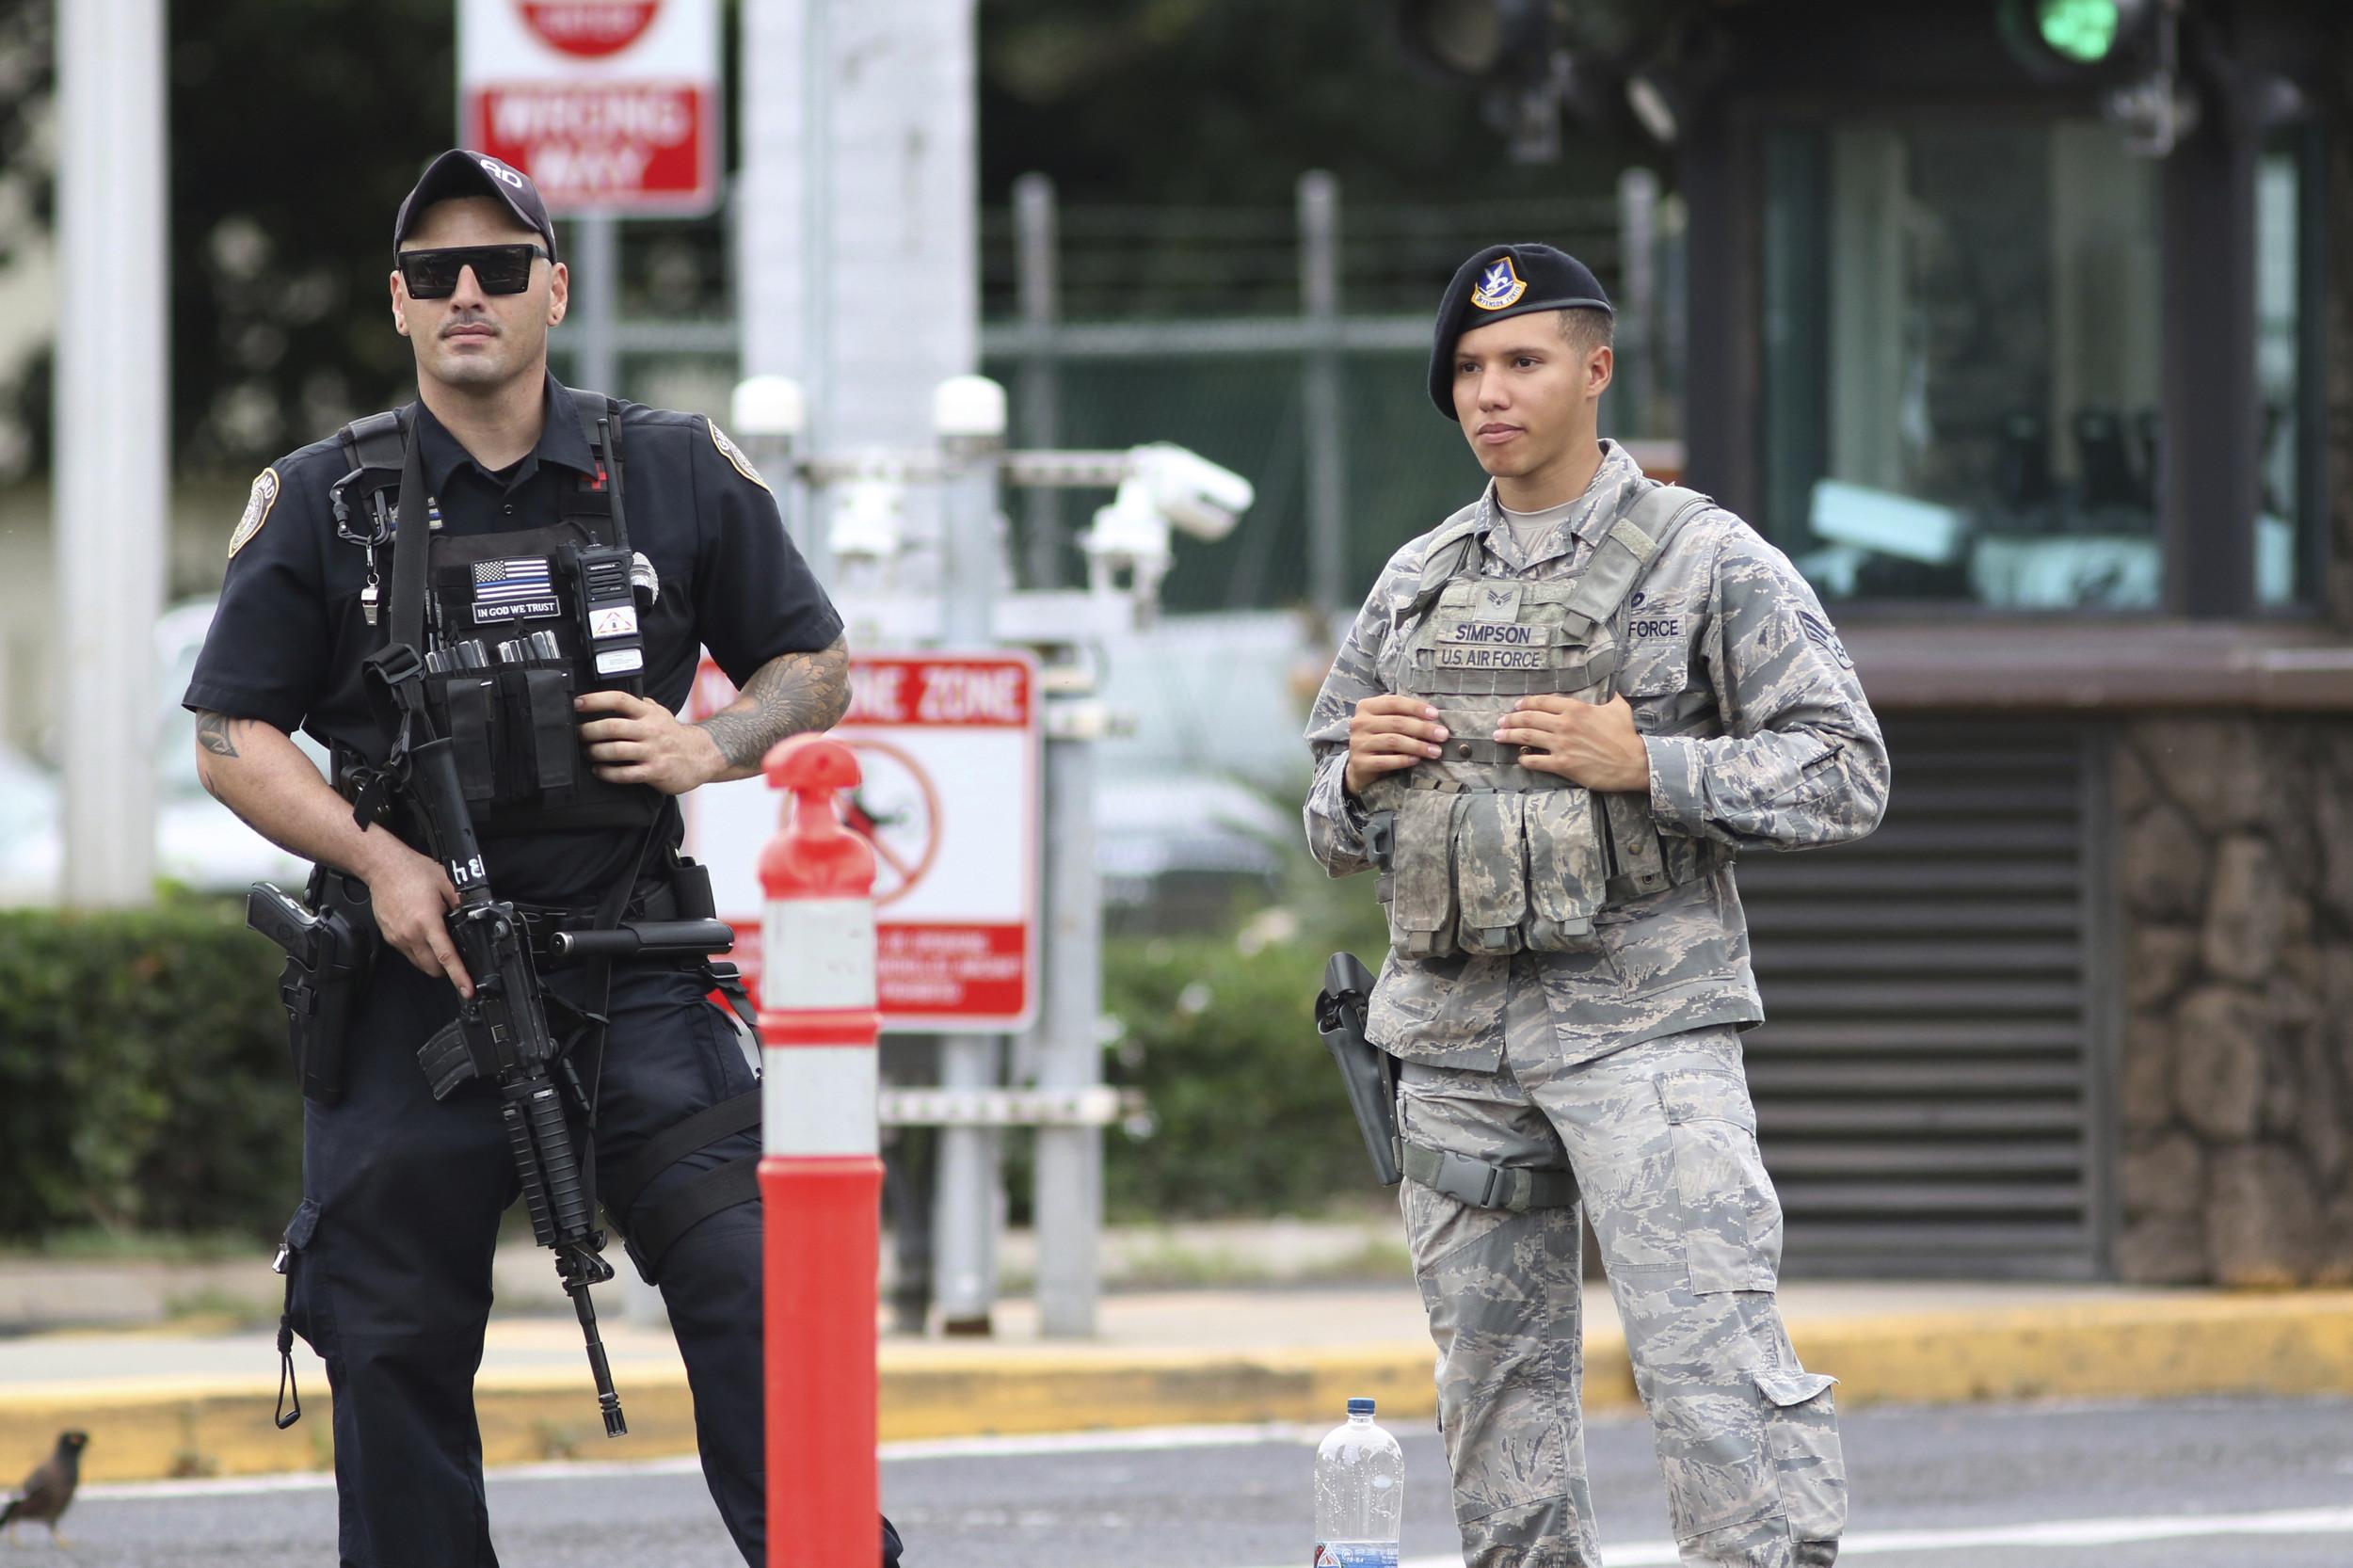 Sailor Kills 2 Civilians, Self At Pearl Harbor Shipyard